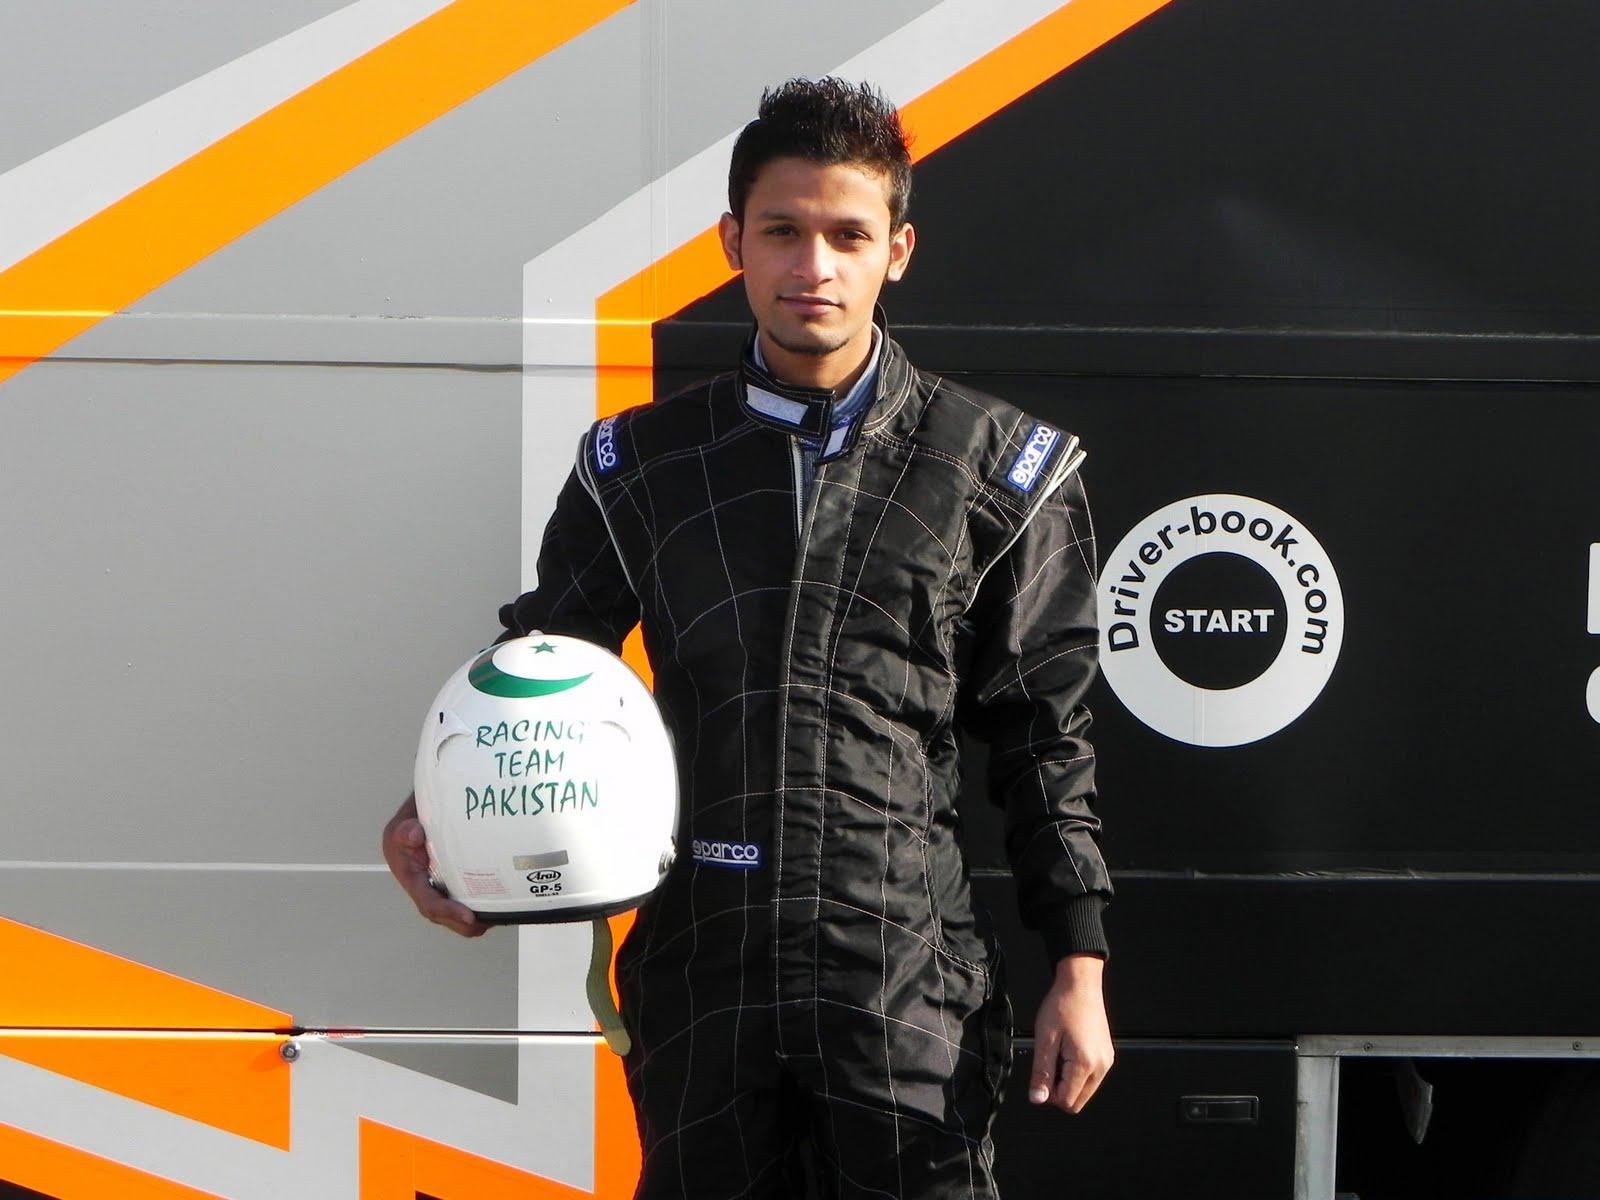 Ahmed Yastoor